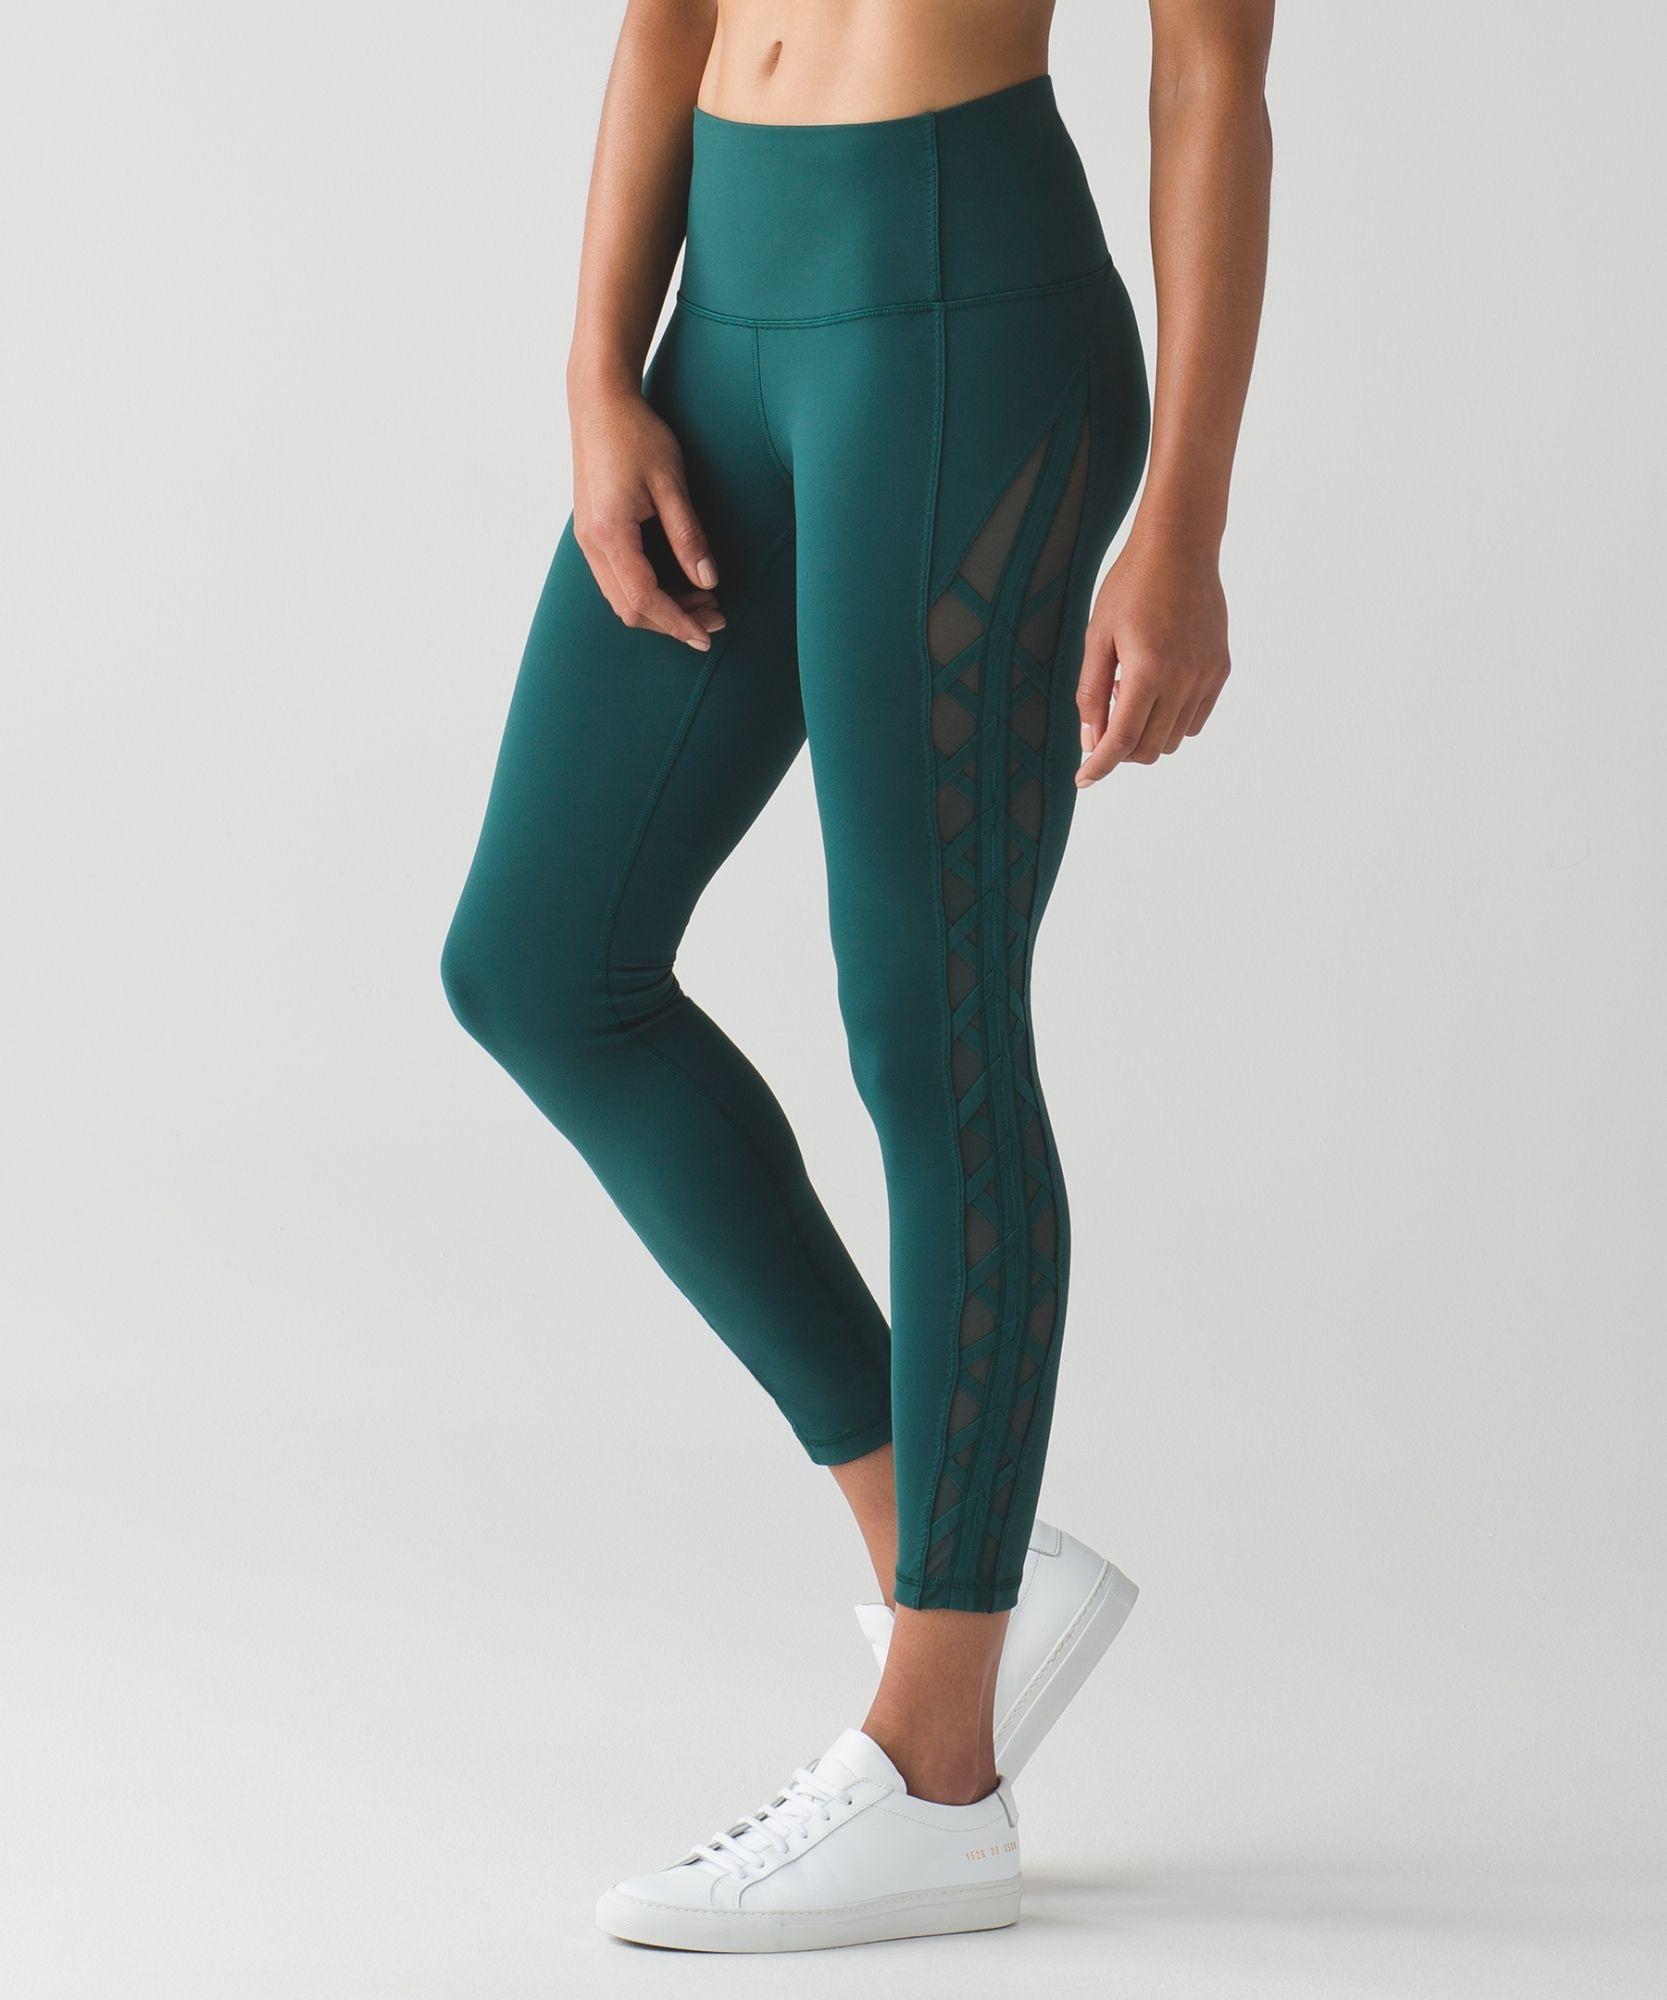 08eb09599 Lululemon mesh leggings. These high-rise ...